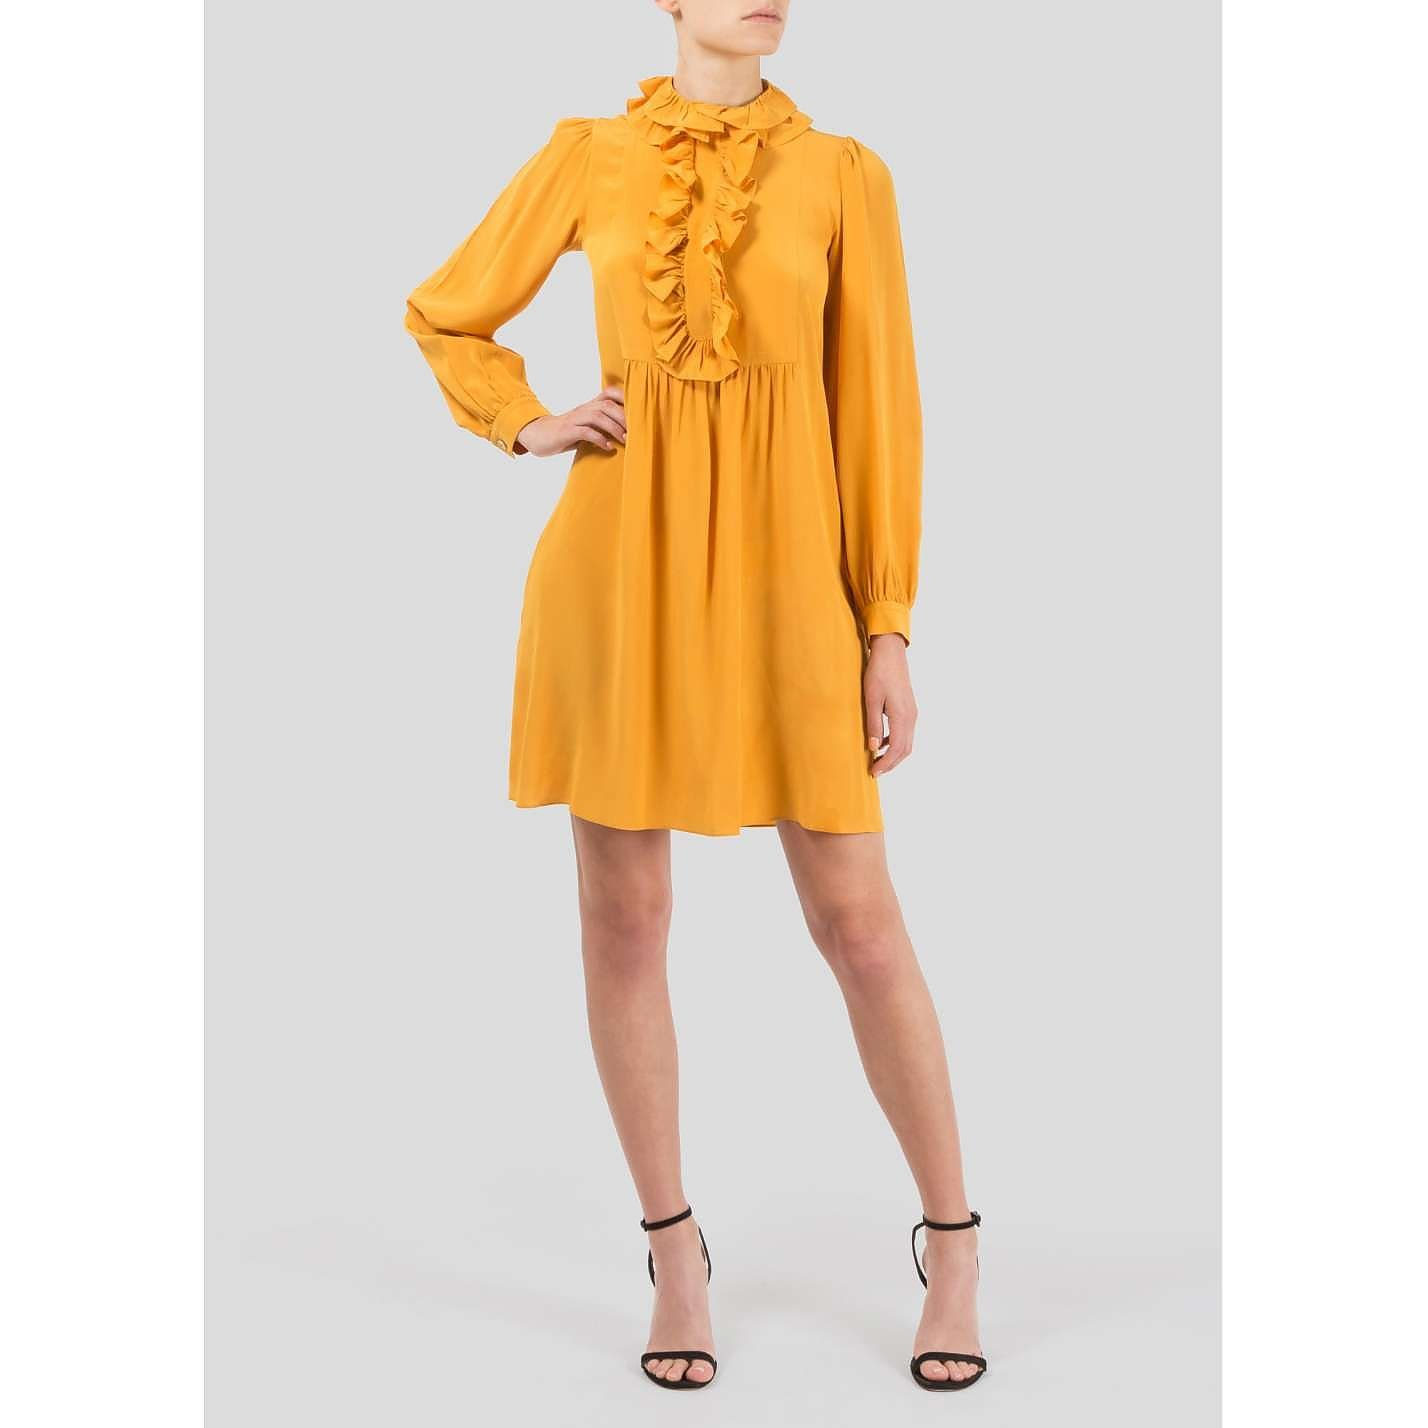 Chloé Ruffle Dress